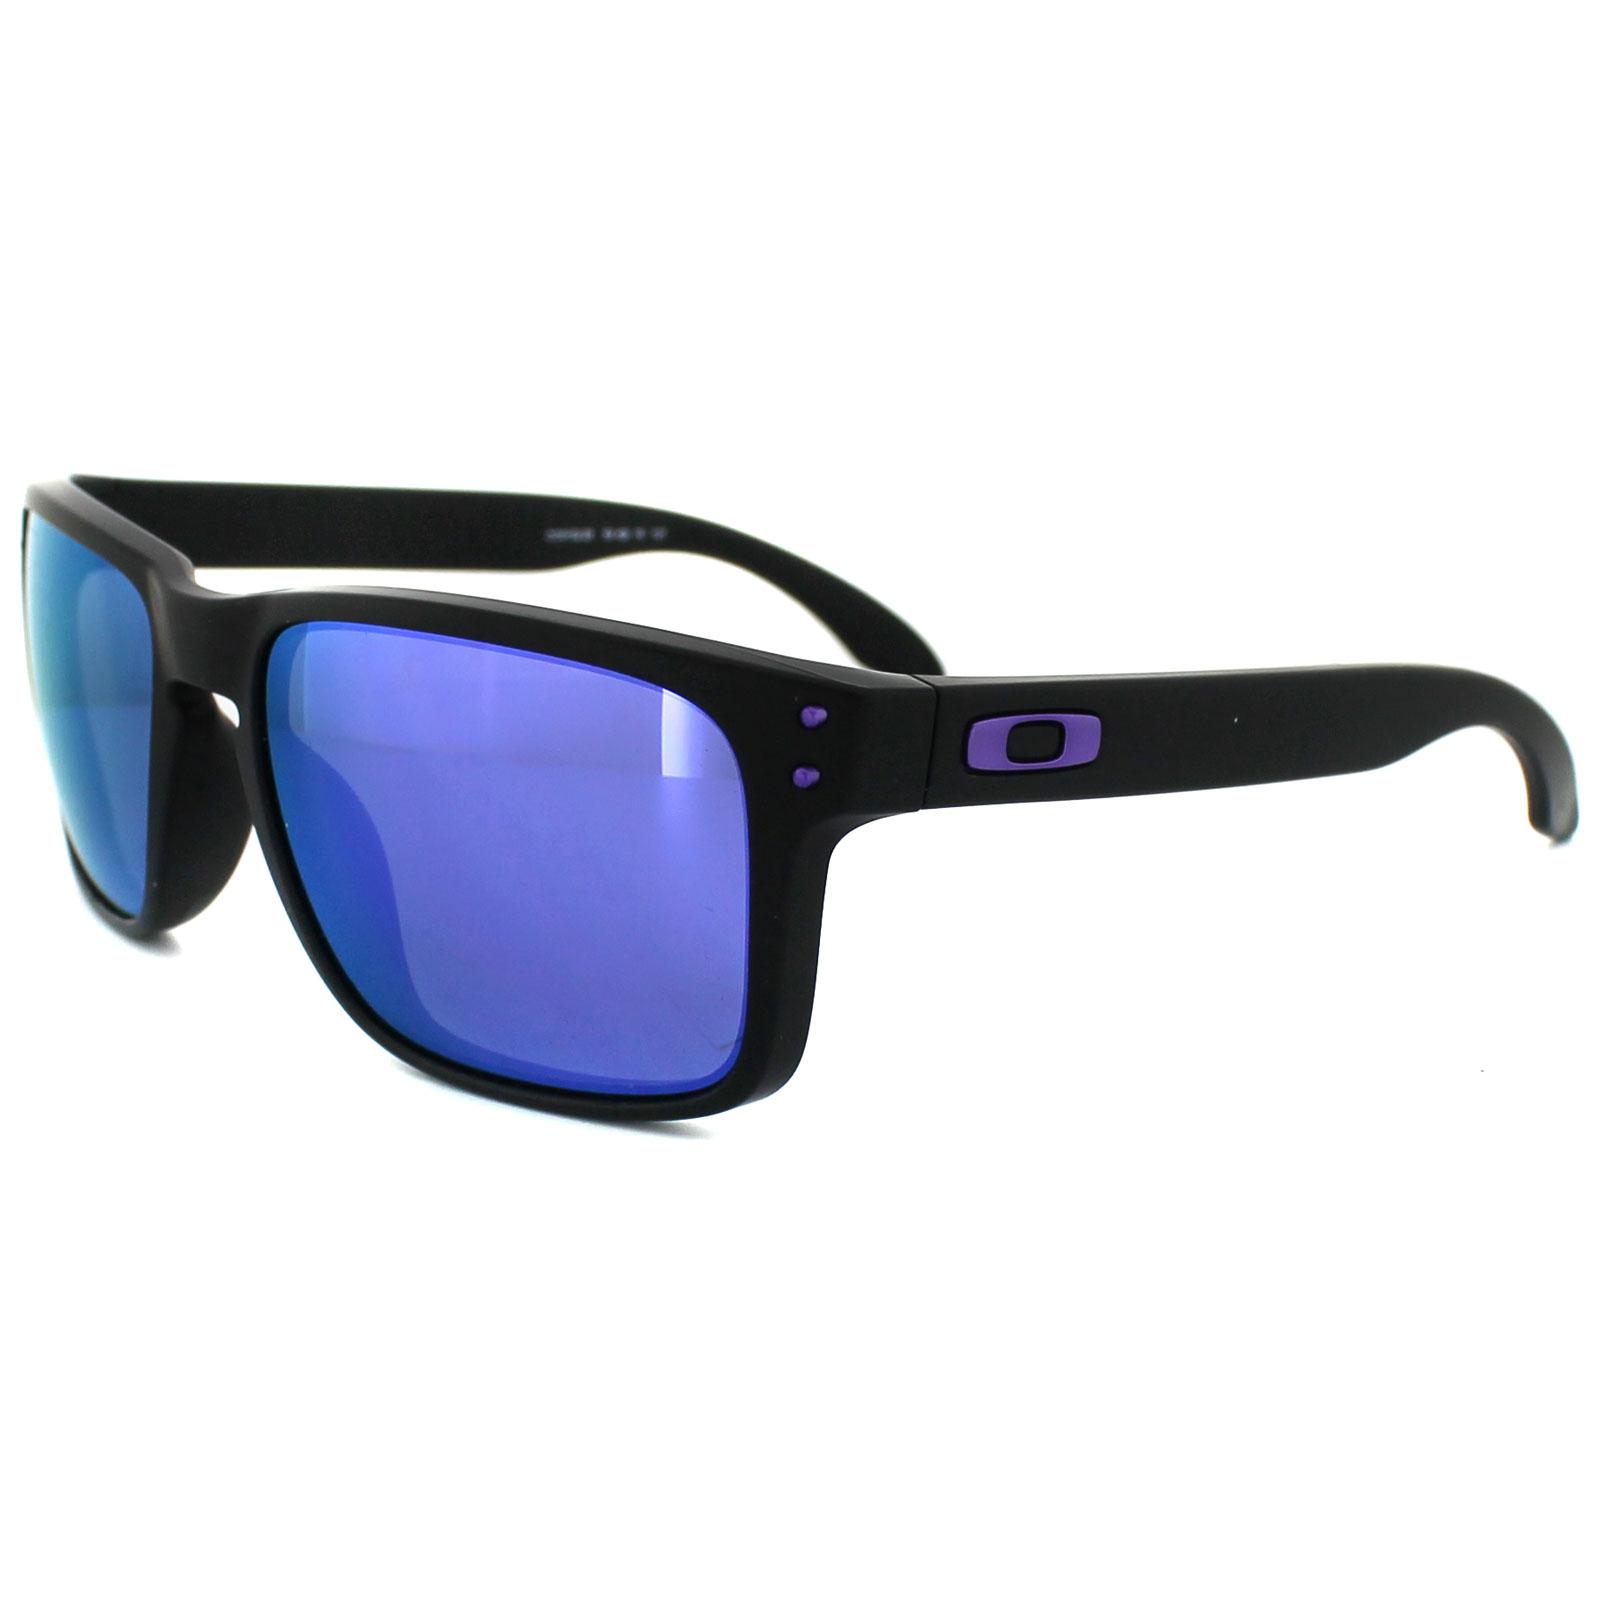 be3d5440c3 Sentinel Thumbnail 1. Sentinel Oakley Sunglasses Holbrook Matt Black Julian  Wilson Violet Iridium ...